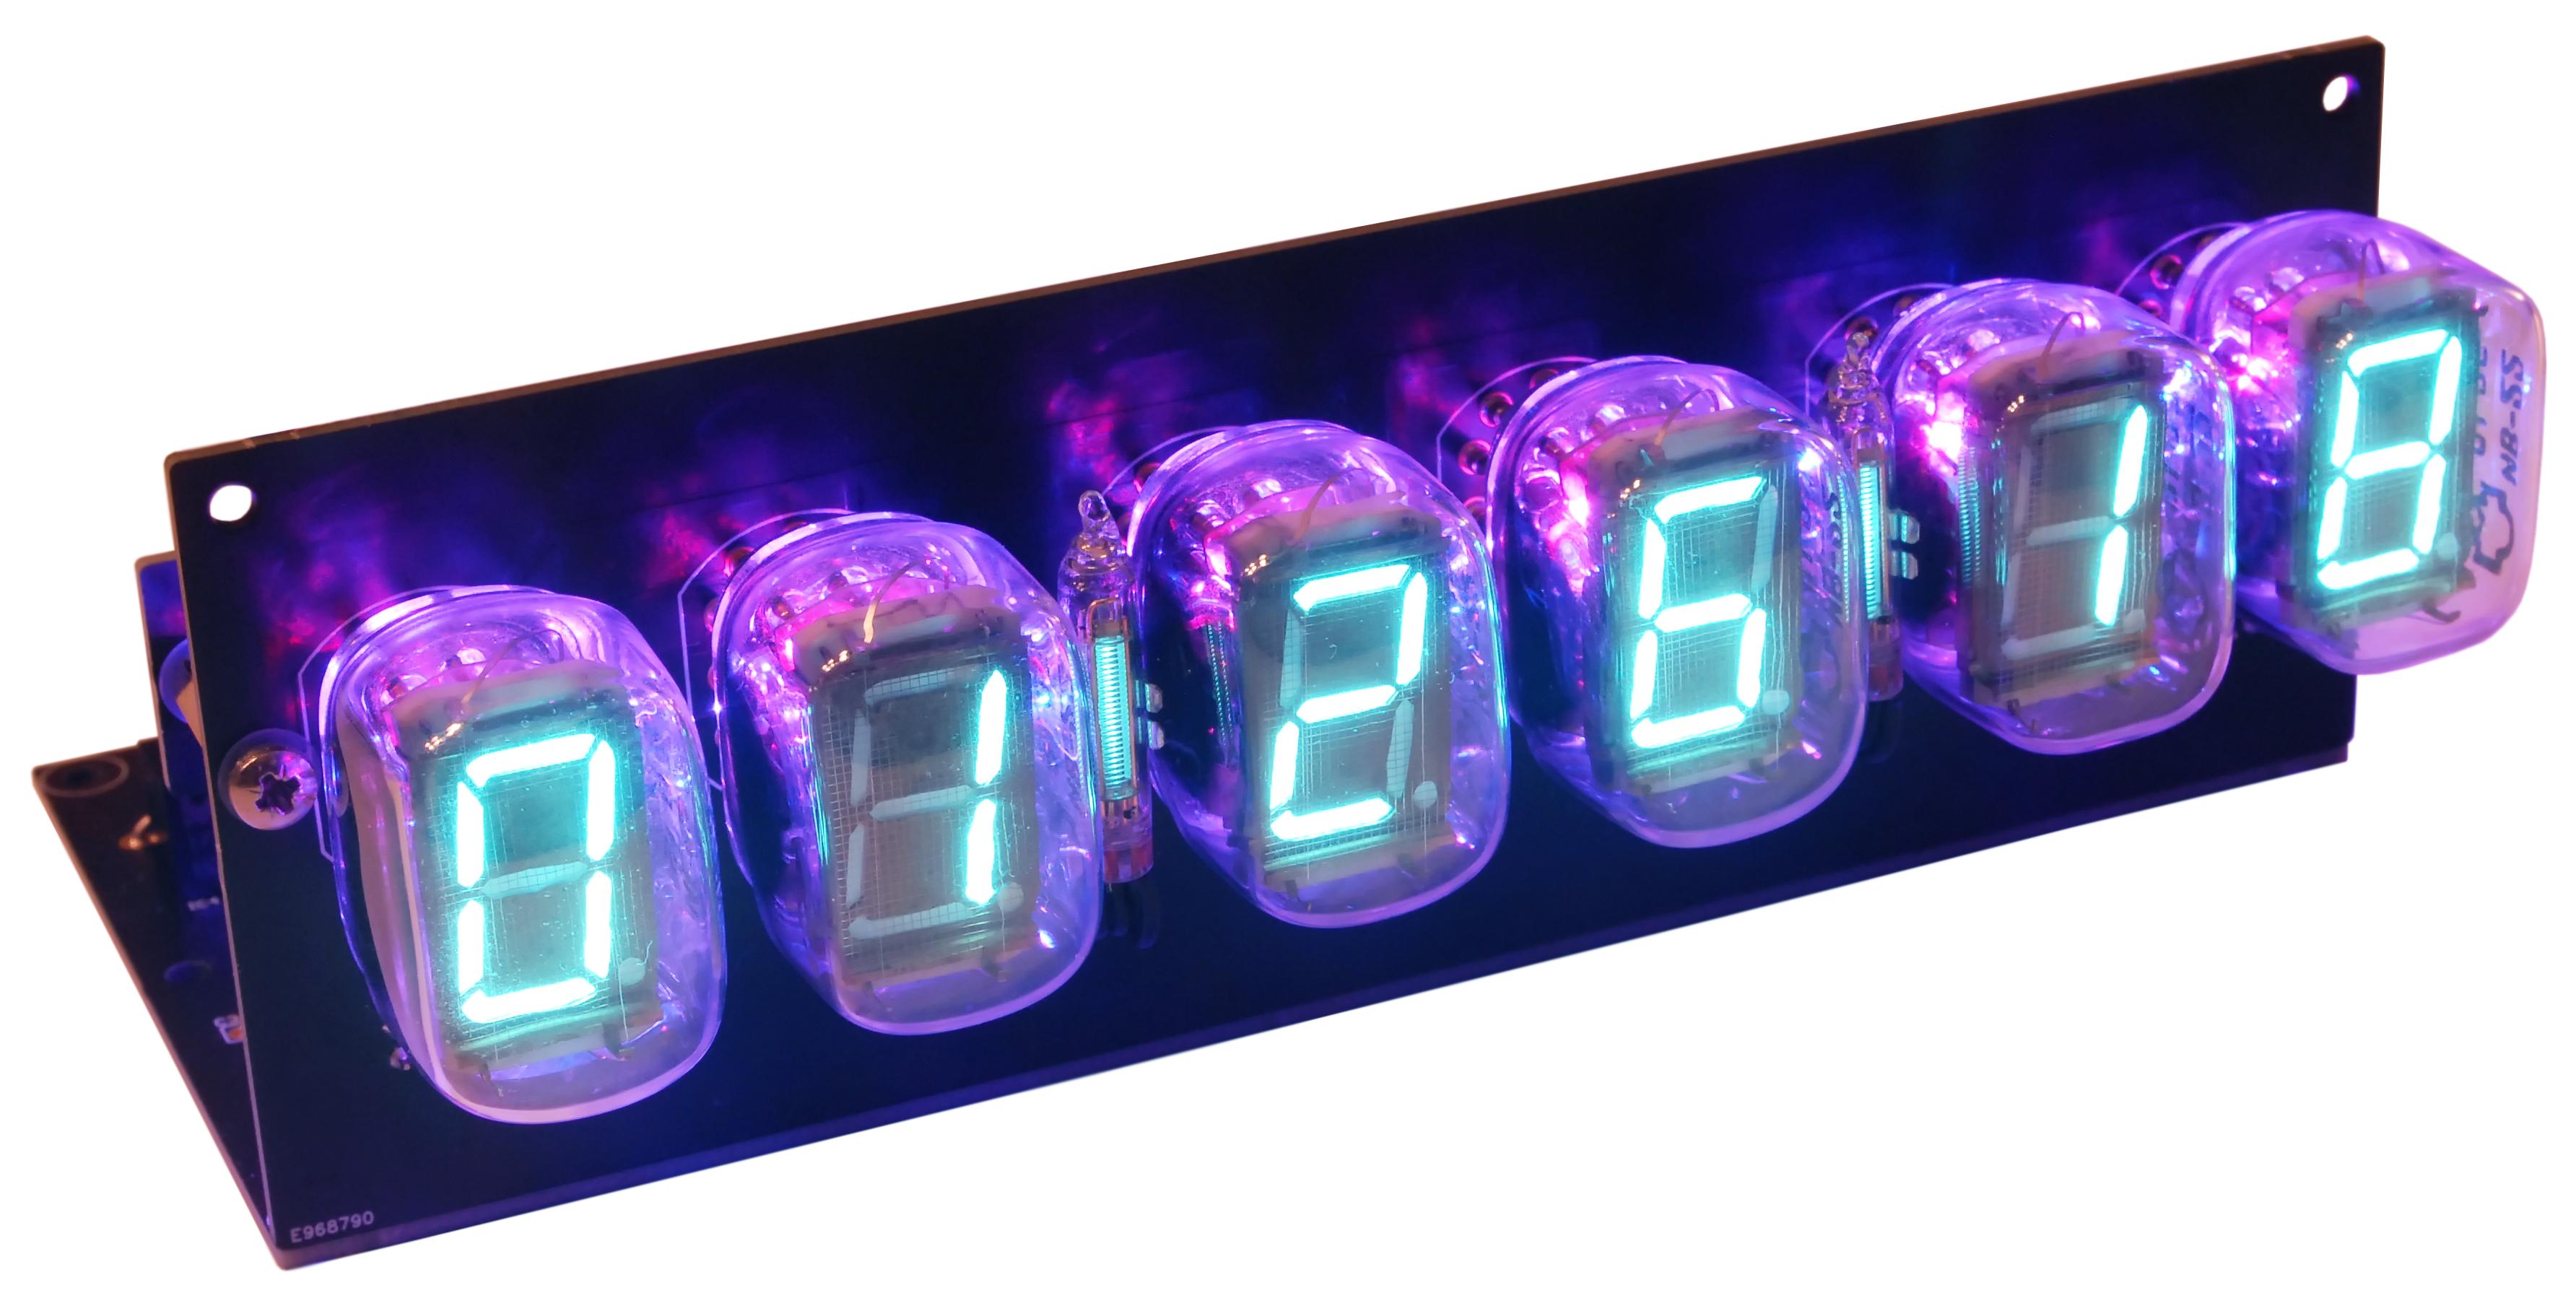 VFD-Tube Clock with ESP32 DevKit-C incl. acrylic case (170573-71)